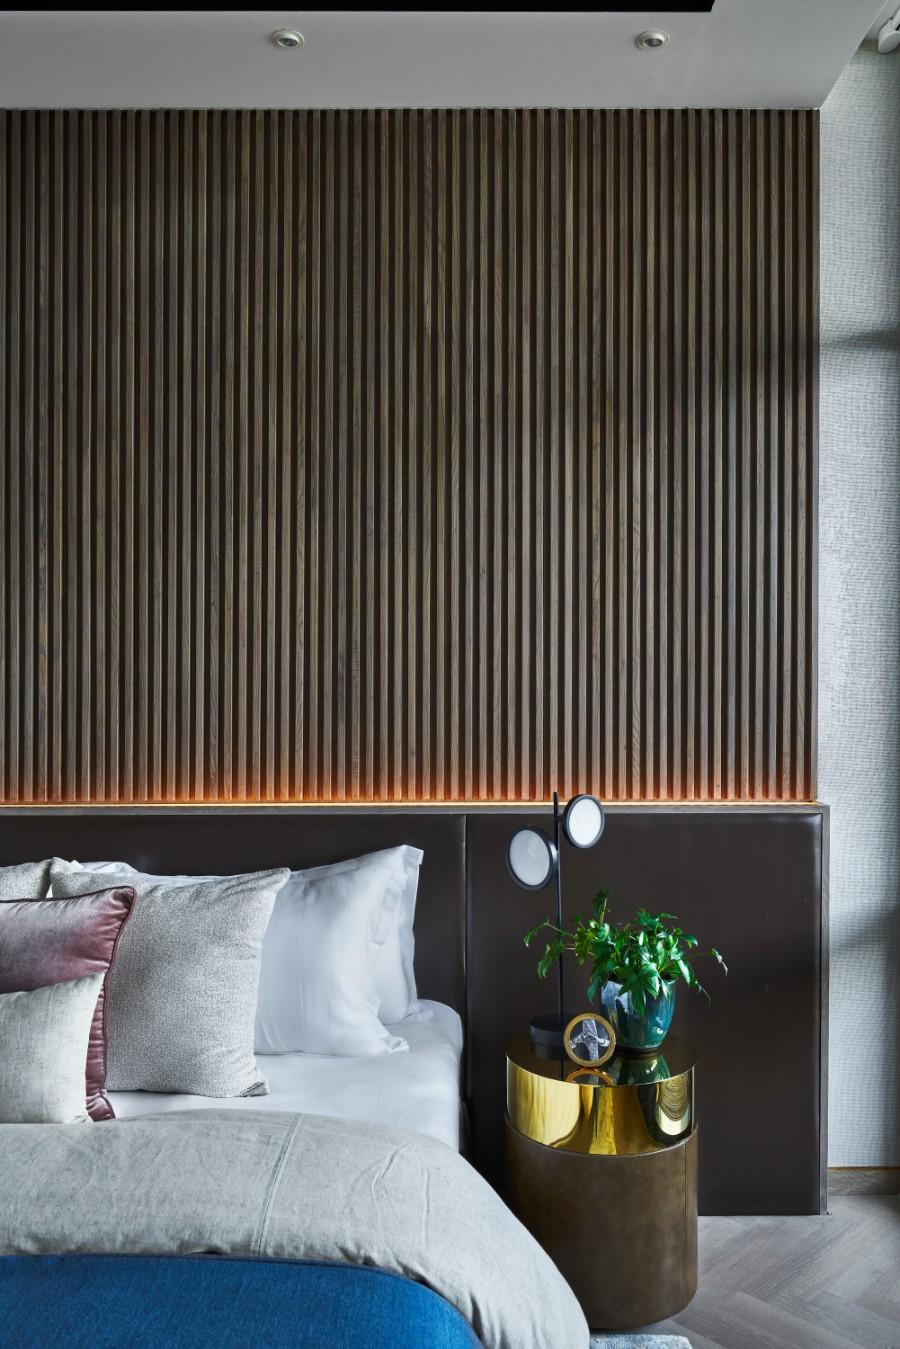 exclusive design Exclusive Design: Altamount Residence by Hirsch Bedner Associates Inside Altamount Residence by Hirsch Bedner Associates 6